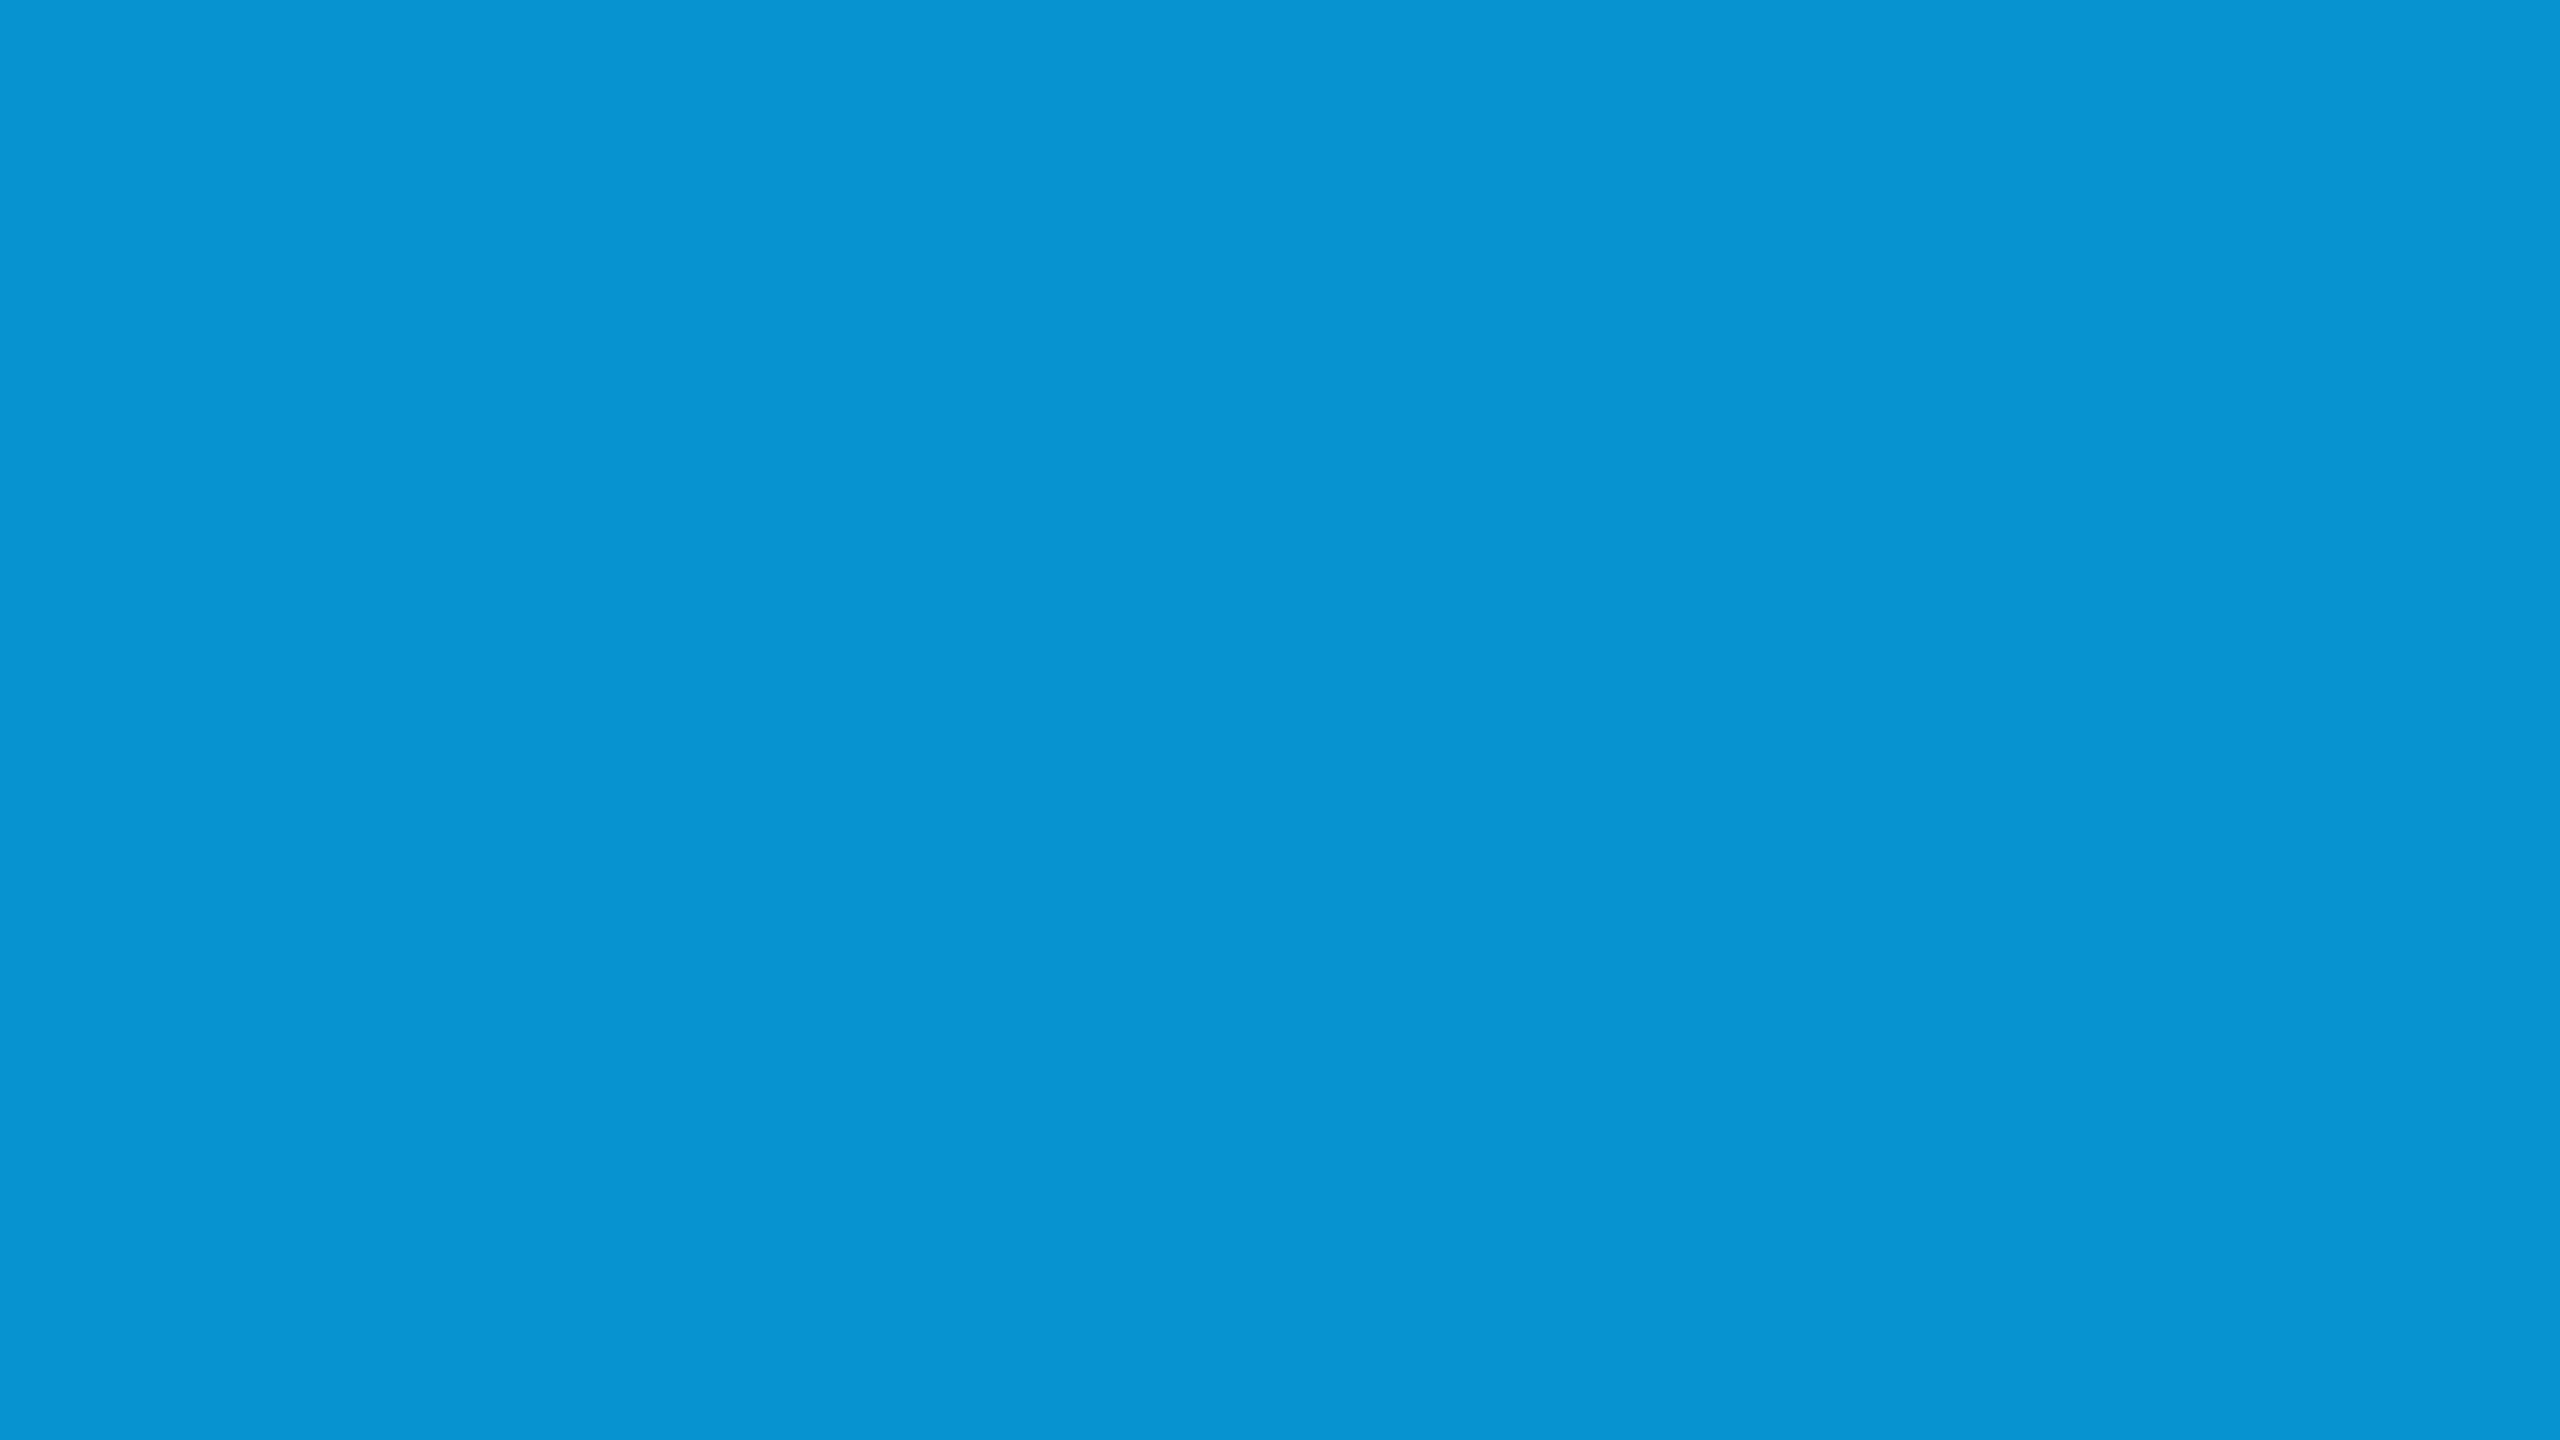 2560x1440 rich electric blue solid color background. Black Bedroom Furniture Sets. Home Design Ideas